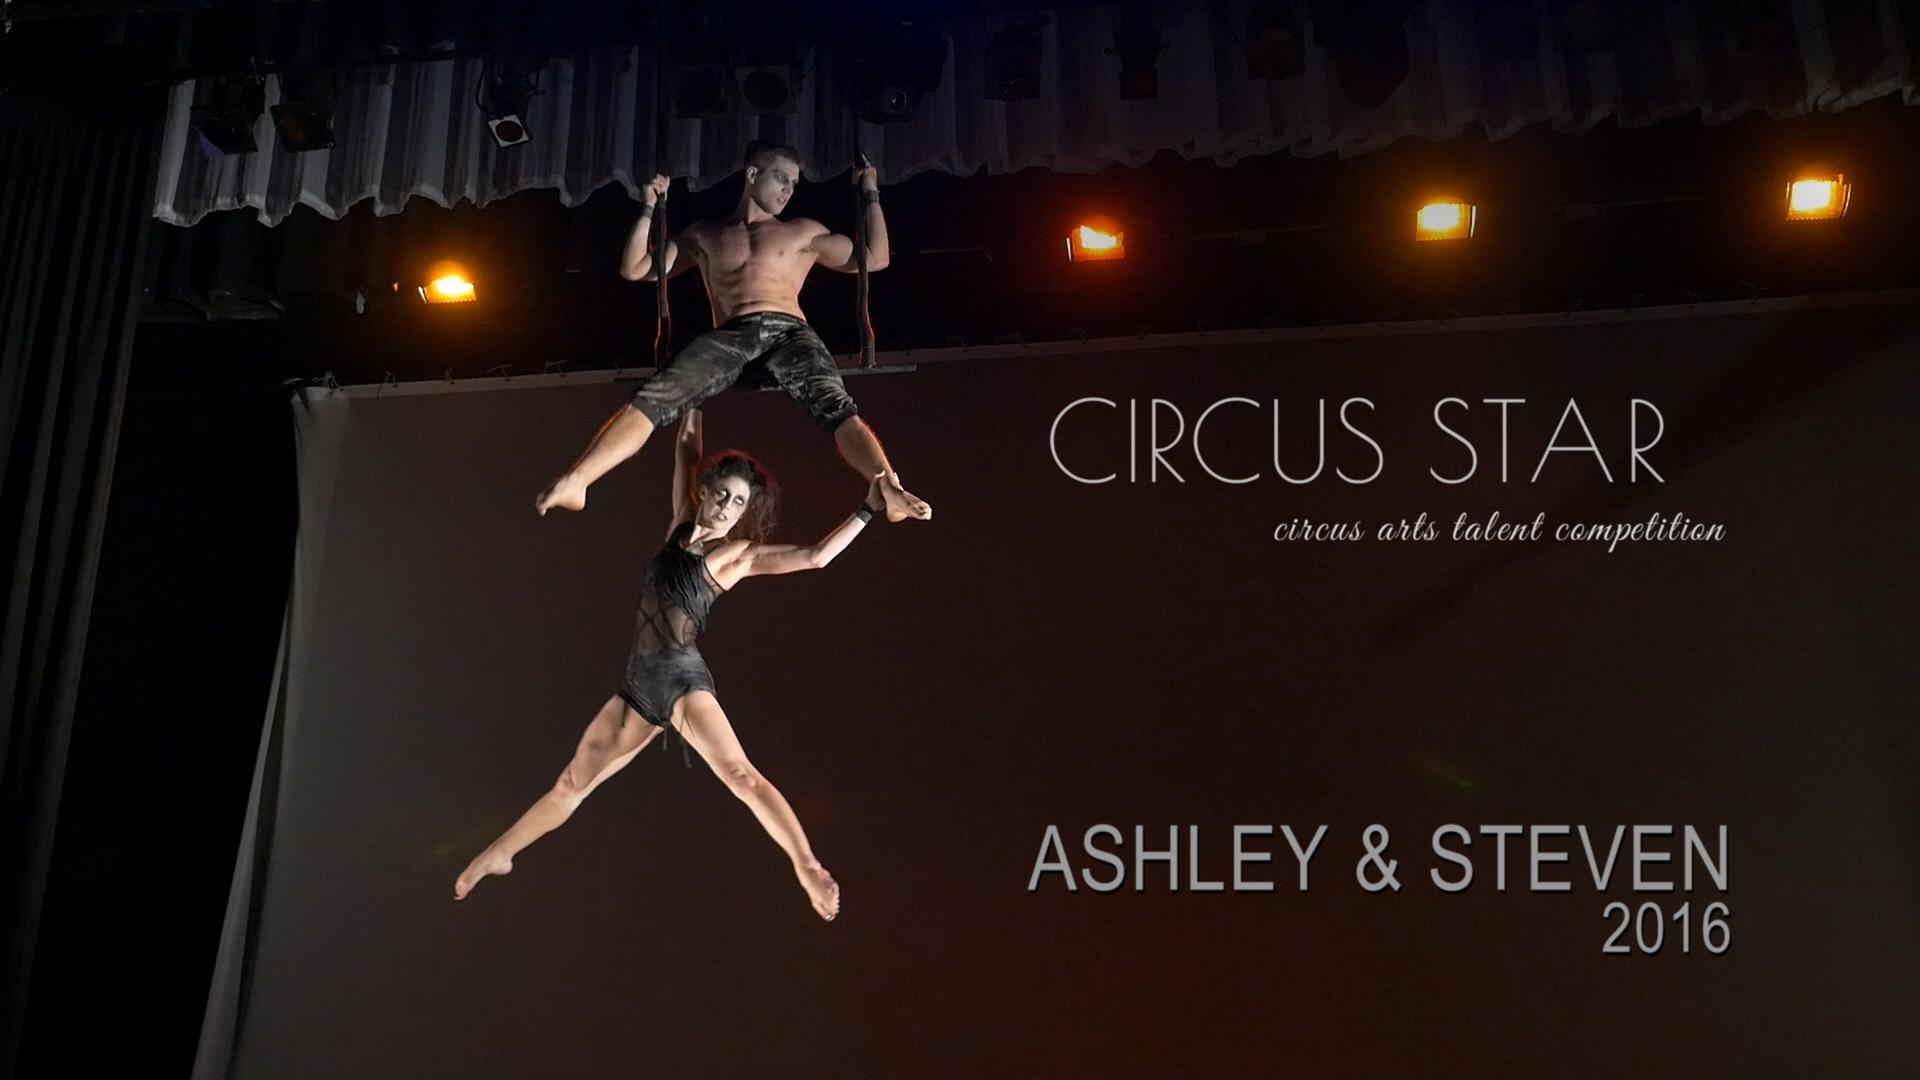 Ashley + Steven, Circus Star USA 2016 performers